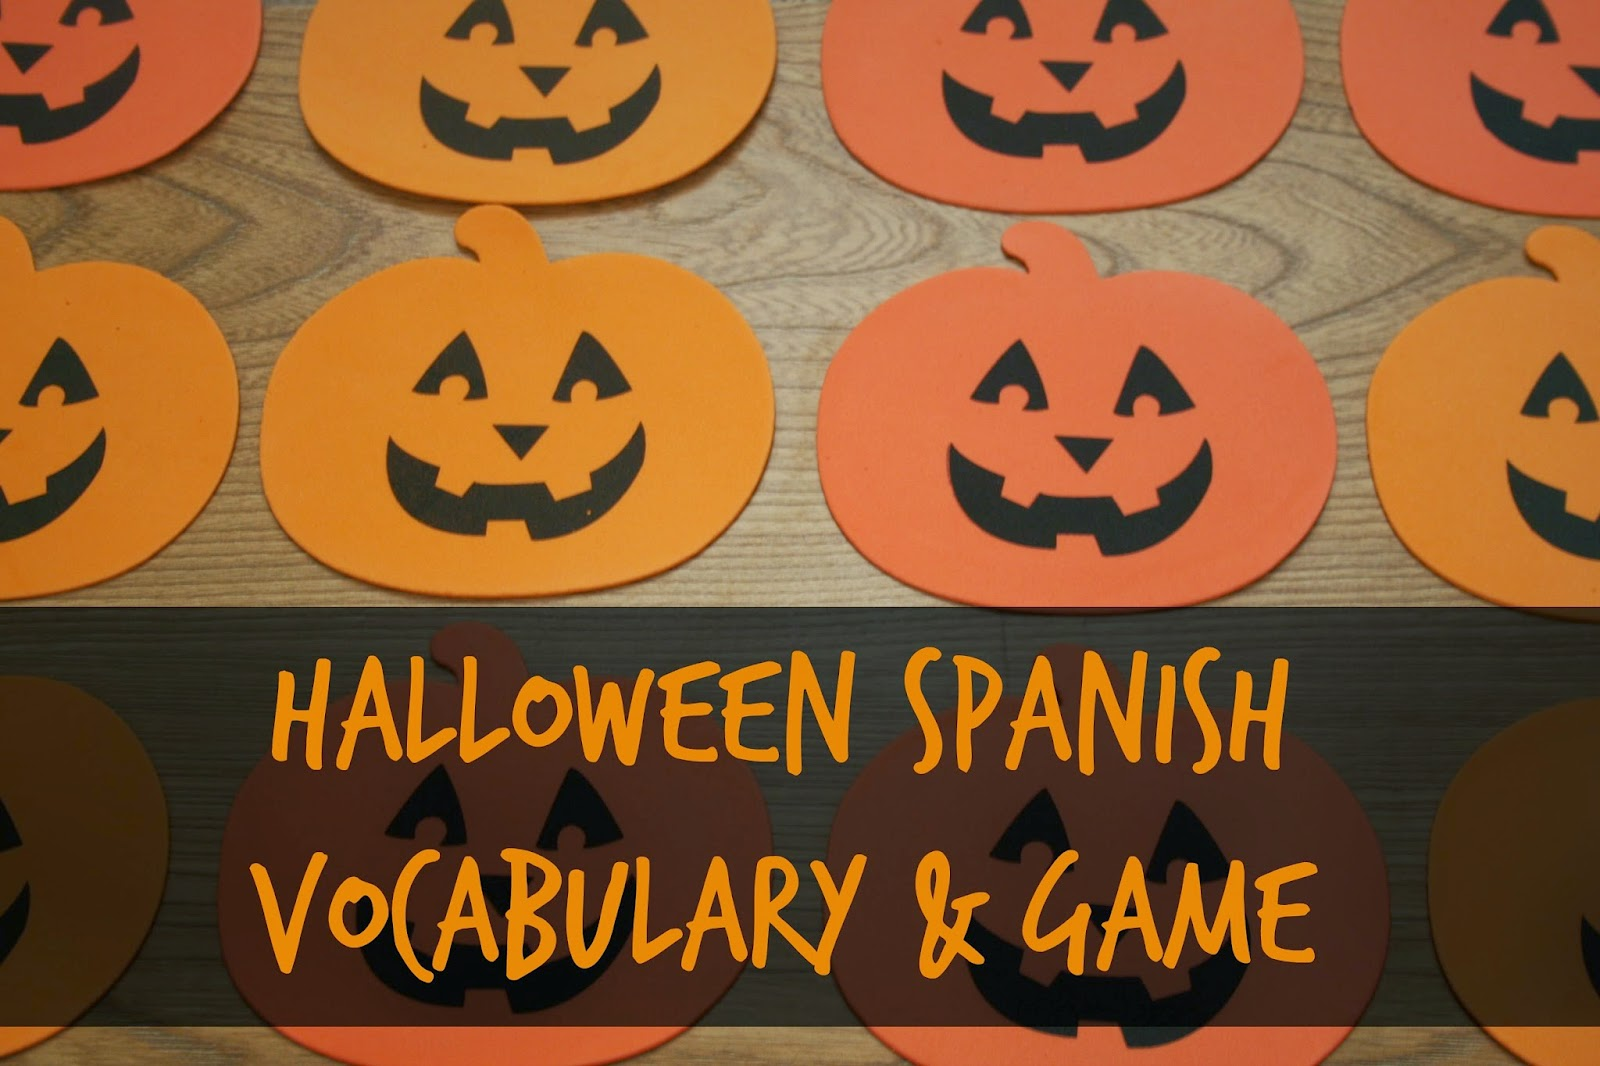 Halloween Spanish Vocab Practice